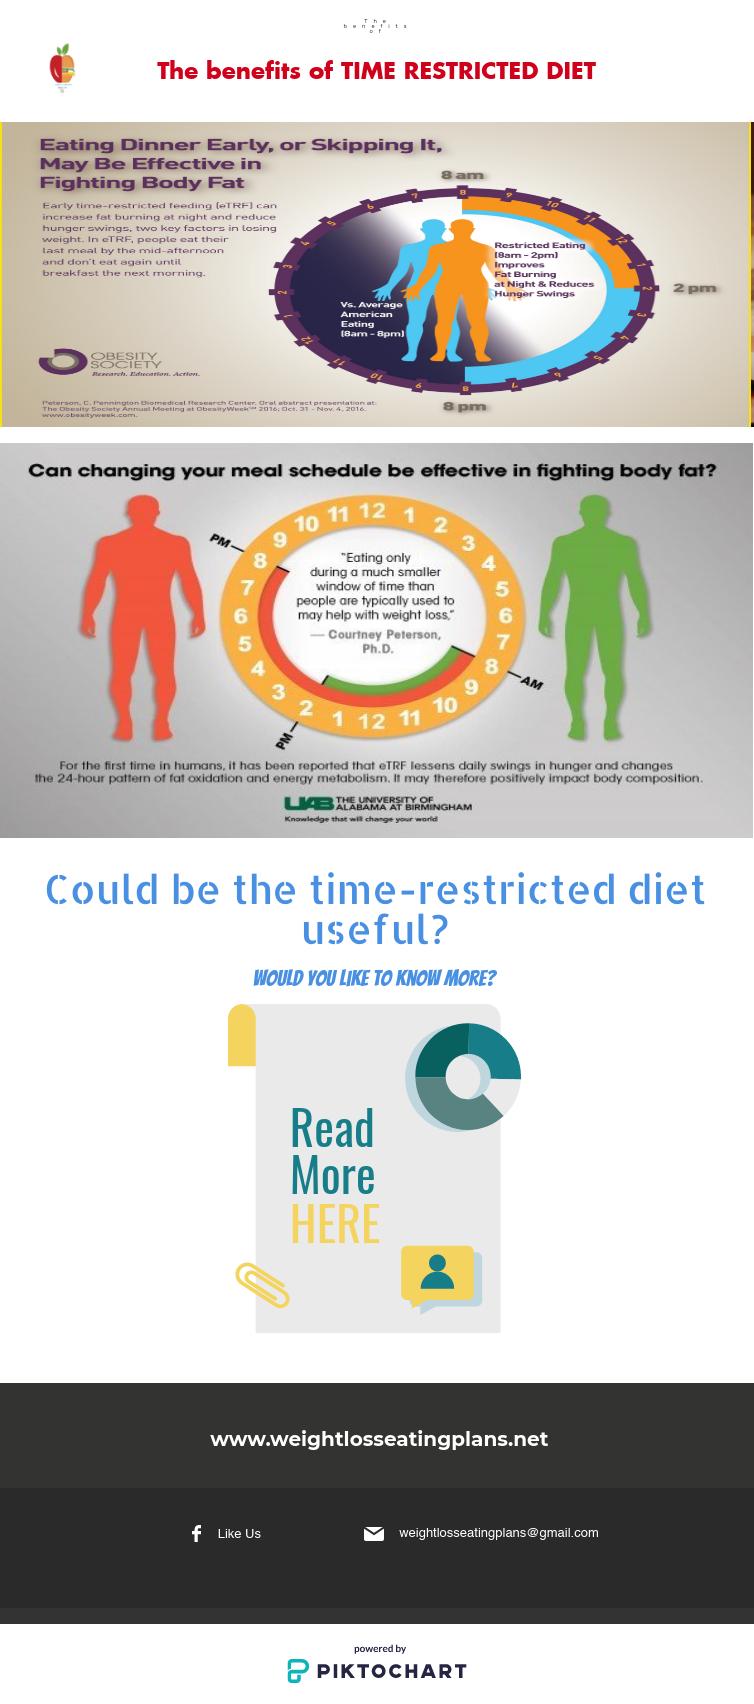 Lose weight just eating veggies